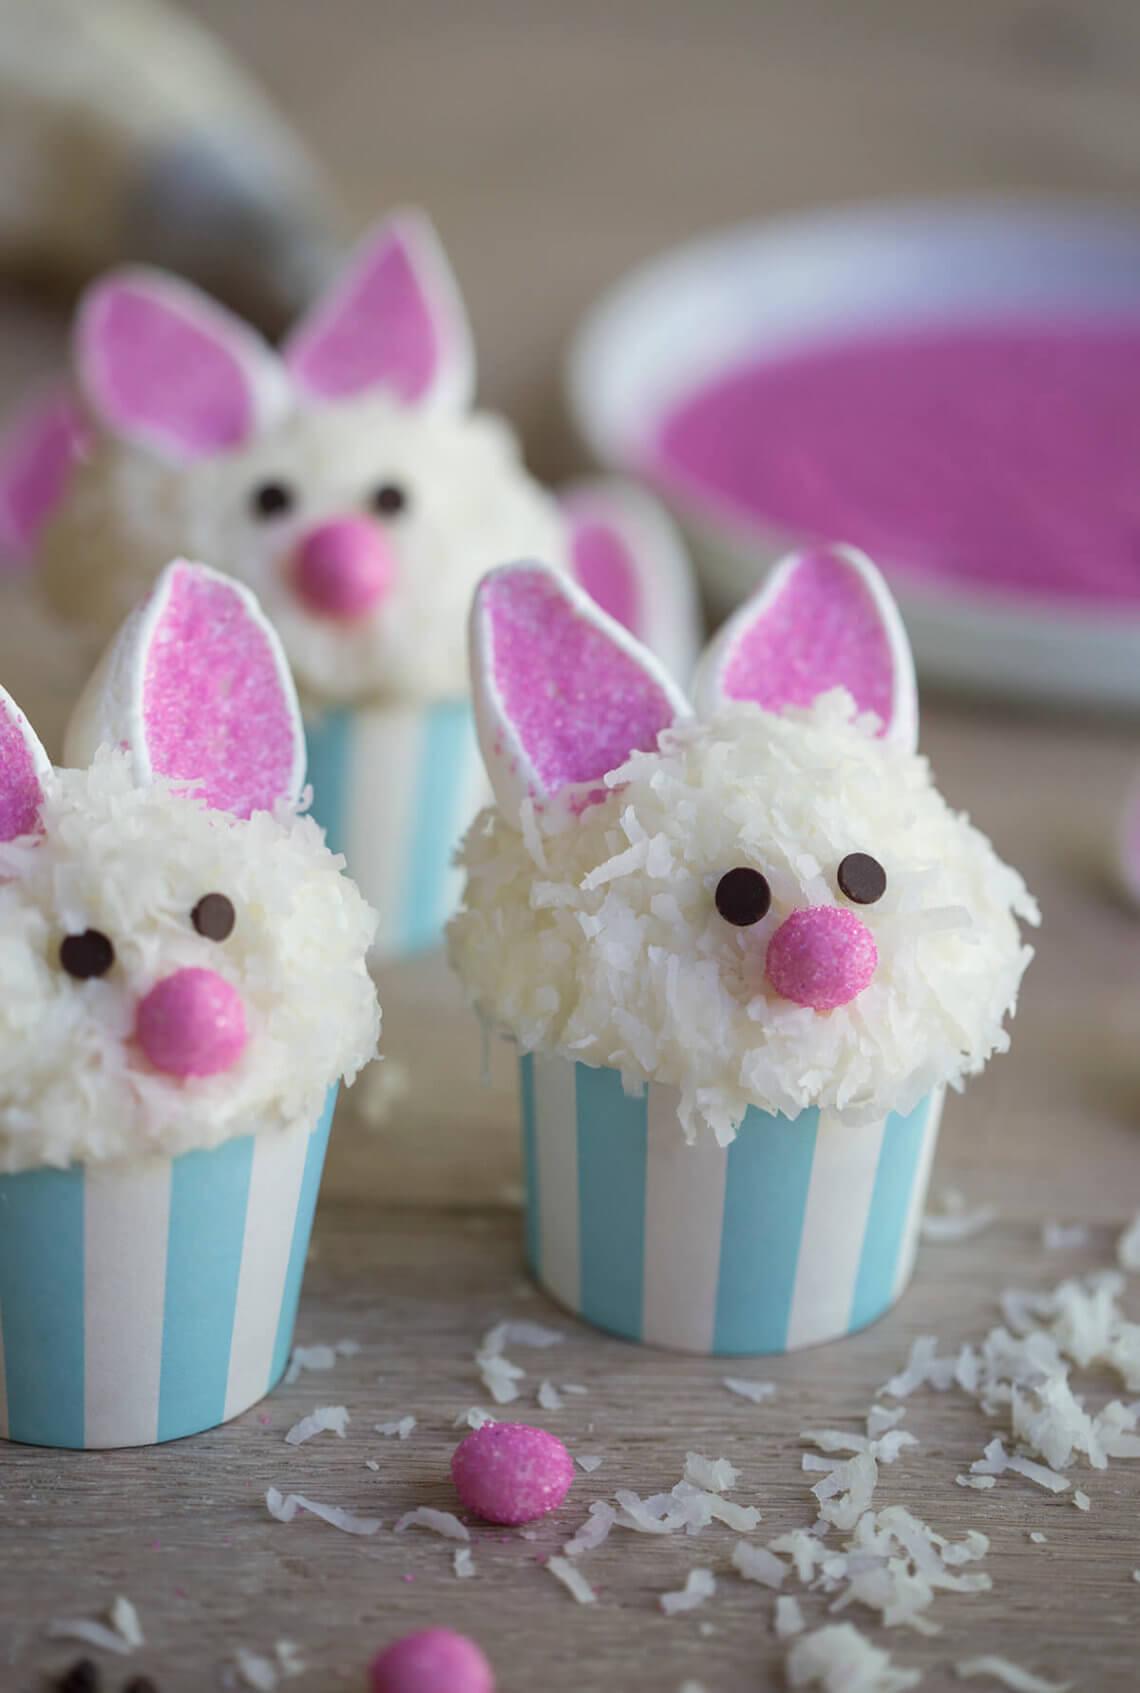 Easter Bunny Cupcakes  Bunny Ear Cupcakes Preppy Kitchen